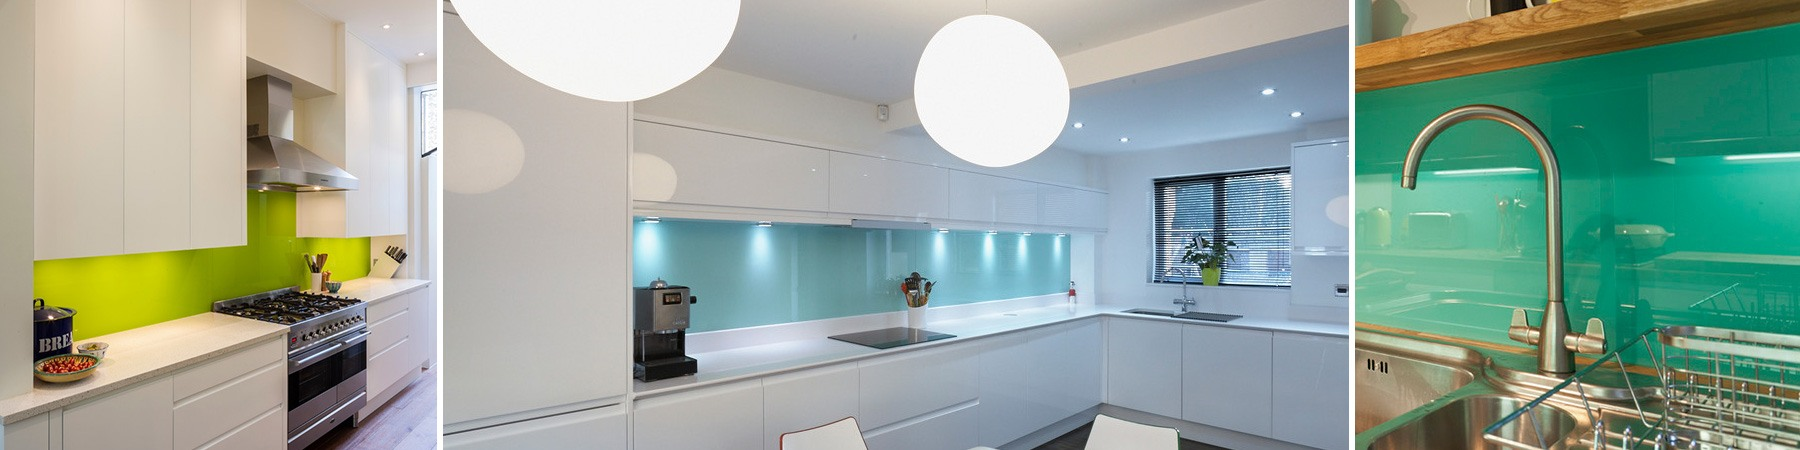 Paneles acrilicos para cocinas elegant paneles acrilicos for Paneles acrilicos para frentes de cocina